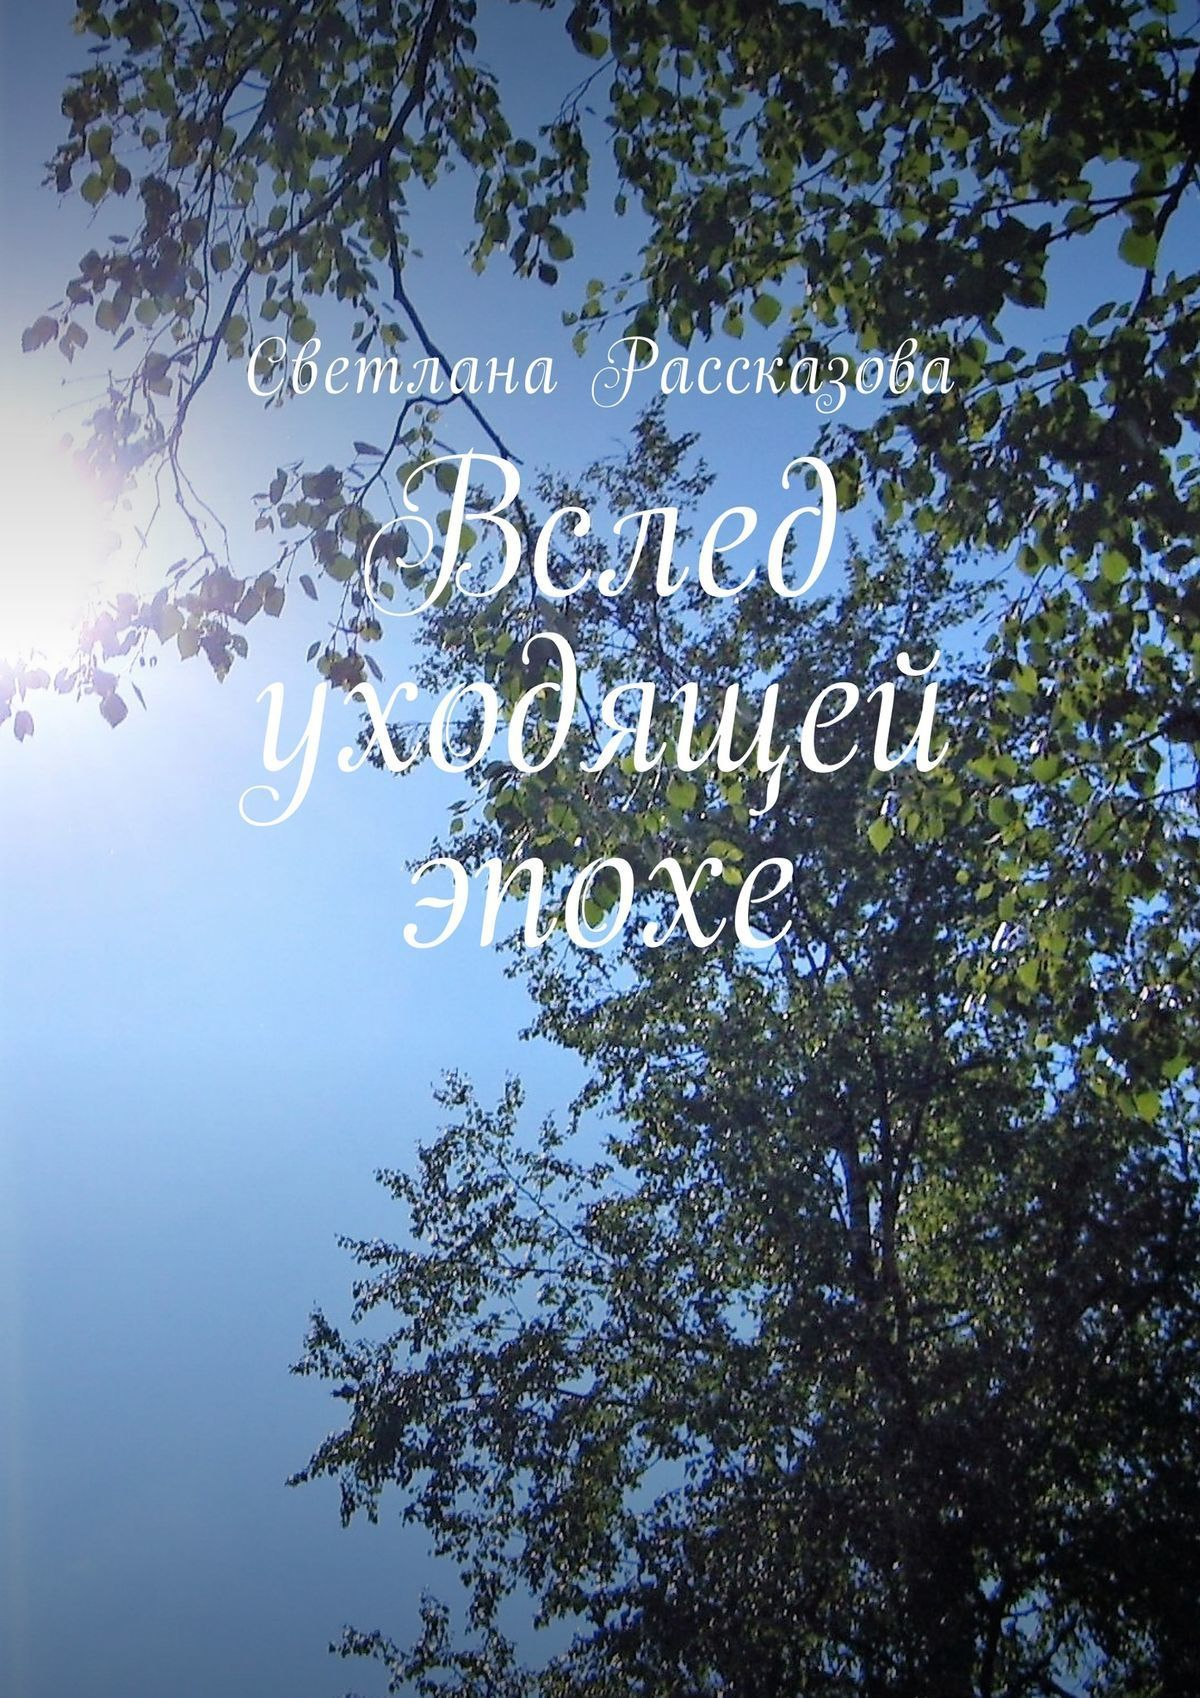 Светлана Рассказова - Вслед уходящей эпохе. Сценарии